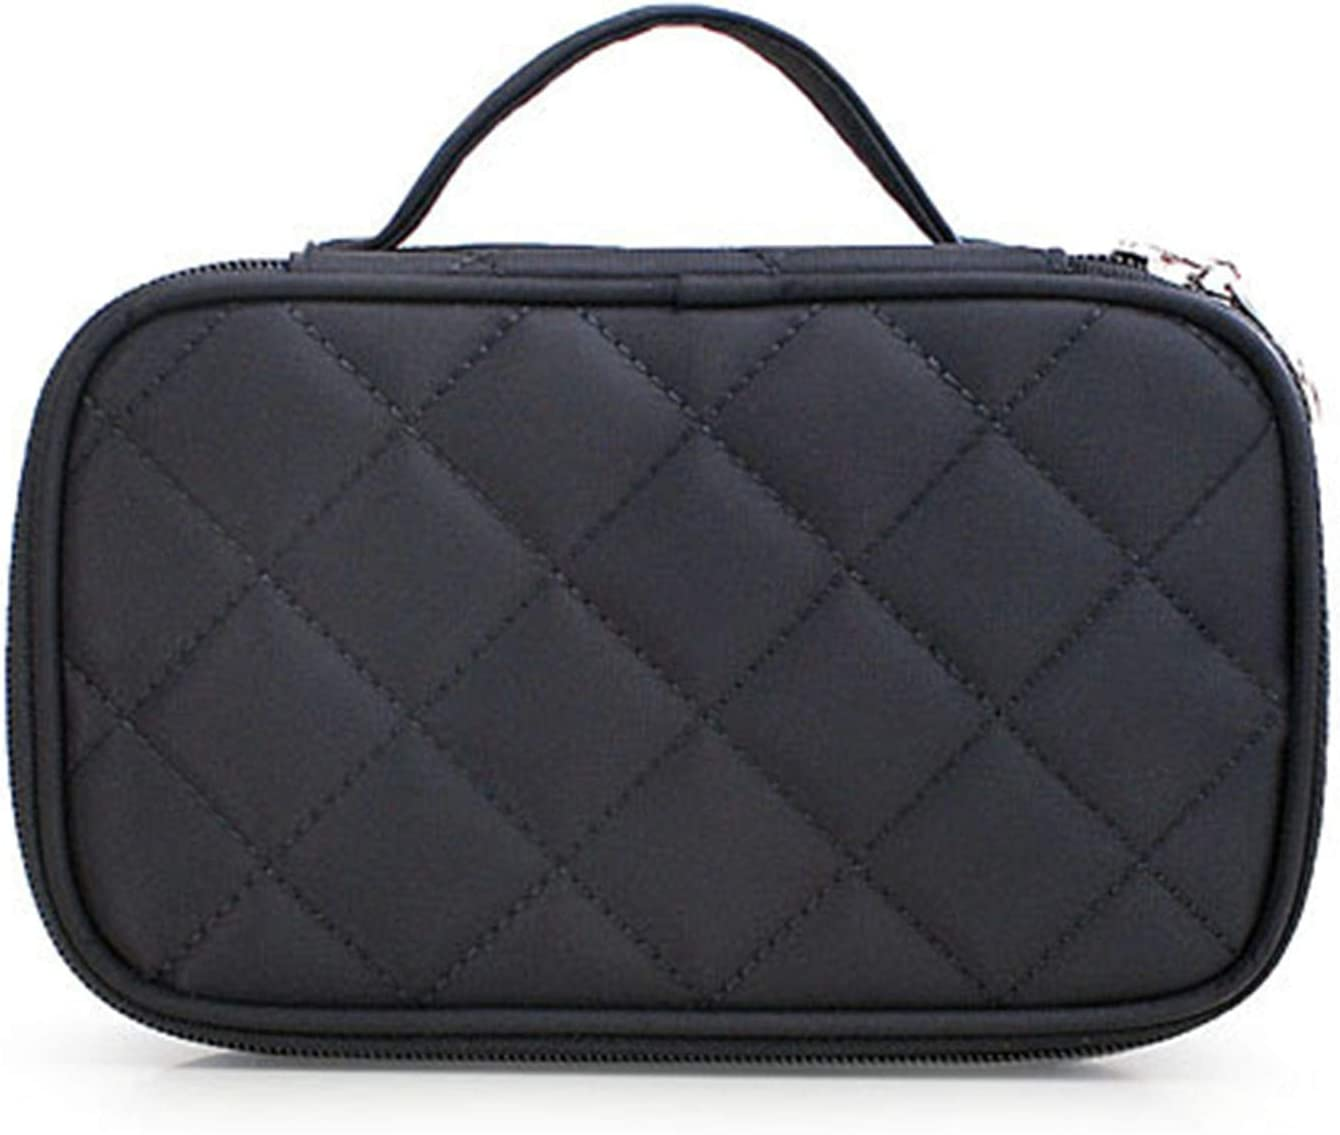 Black Large Makeup Bag, Travel Cosmetic Bag, Makeup Organizer Bag with Mirror for Women and Girls (Black)